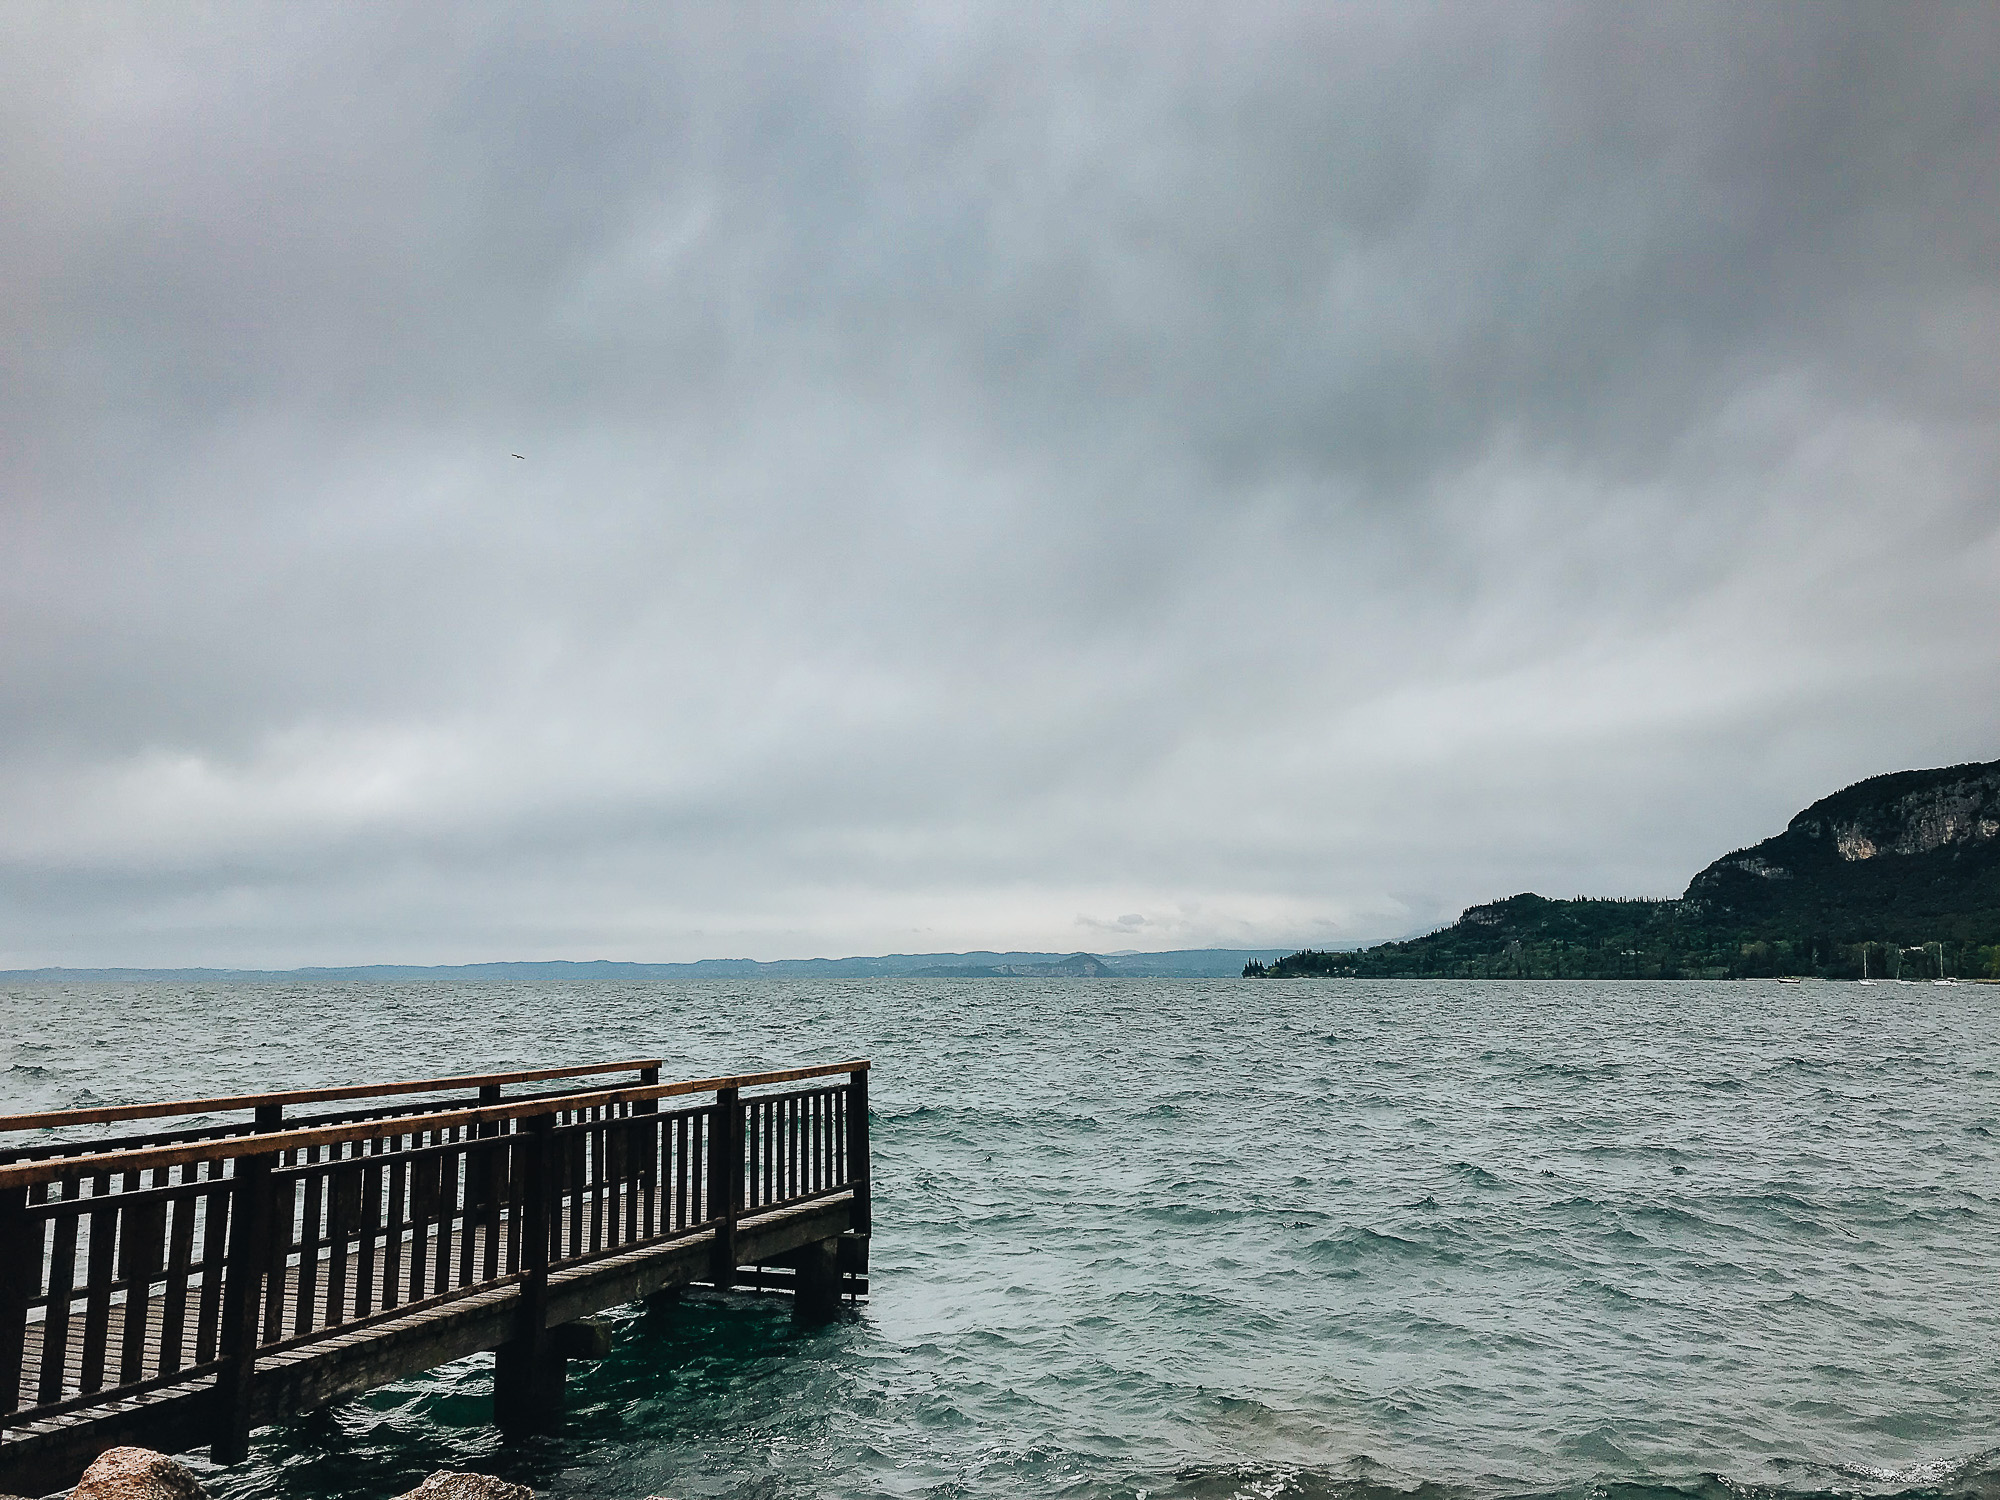 OurBeautifulAdventure-LakeGarda-Italy-Blog-6406.jpg